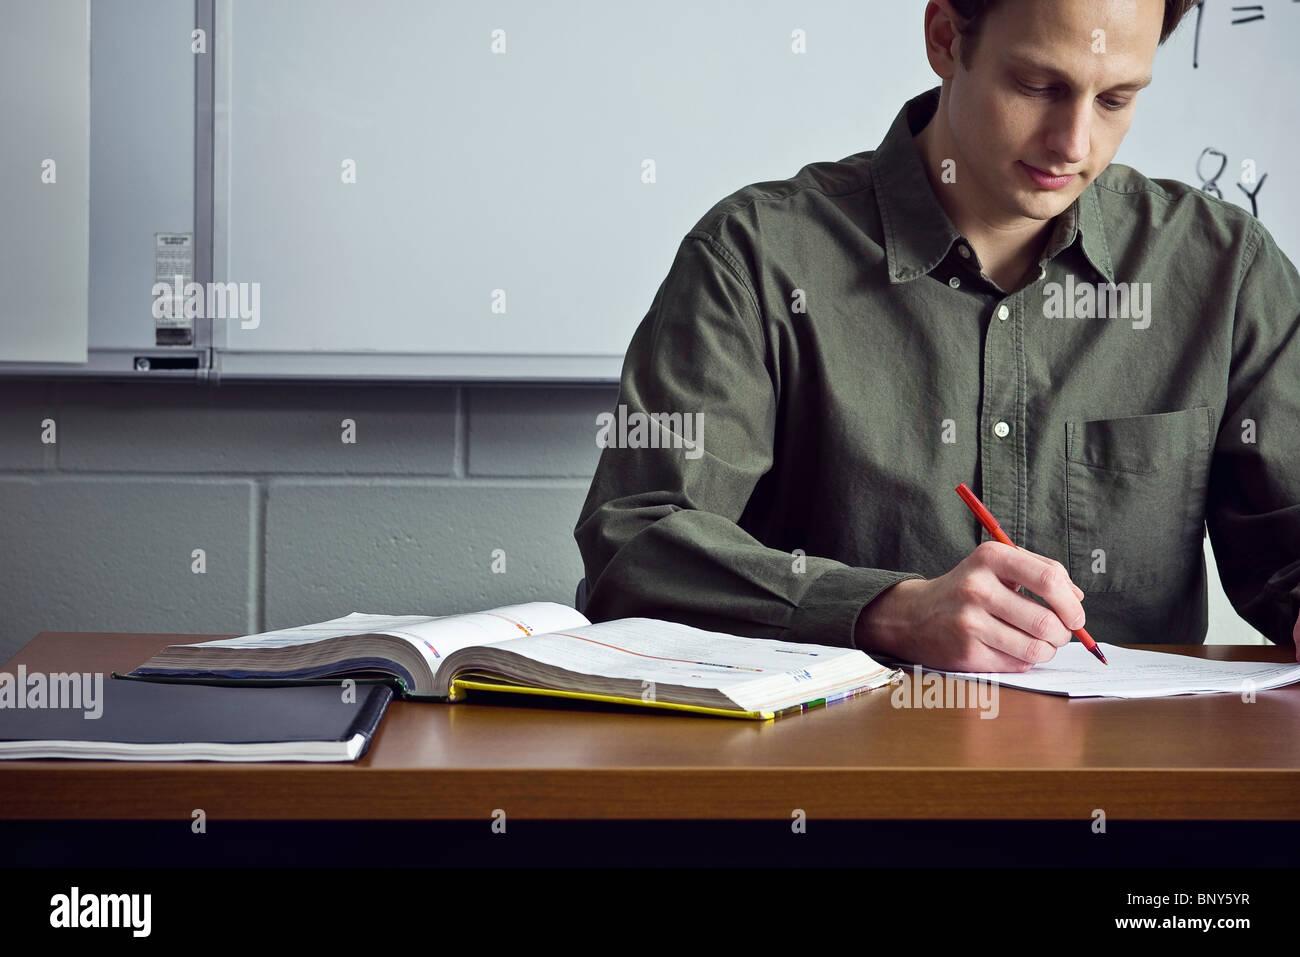 teacher grading homework assignments stock photo 30715547 alamy